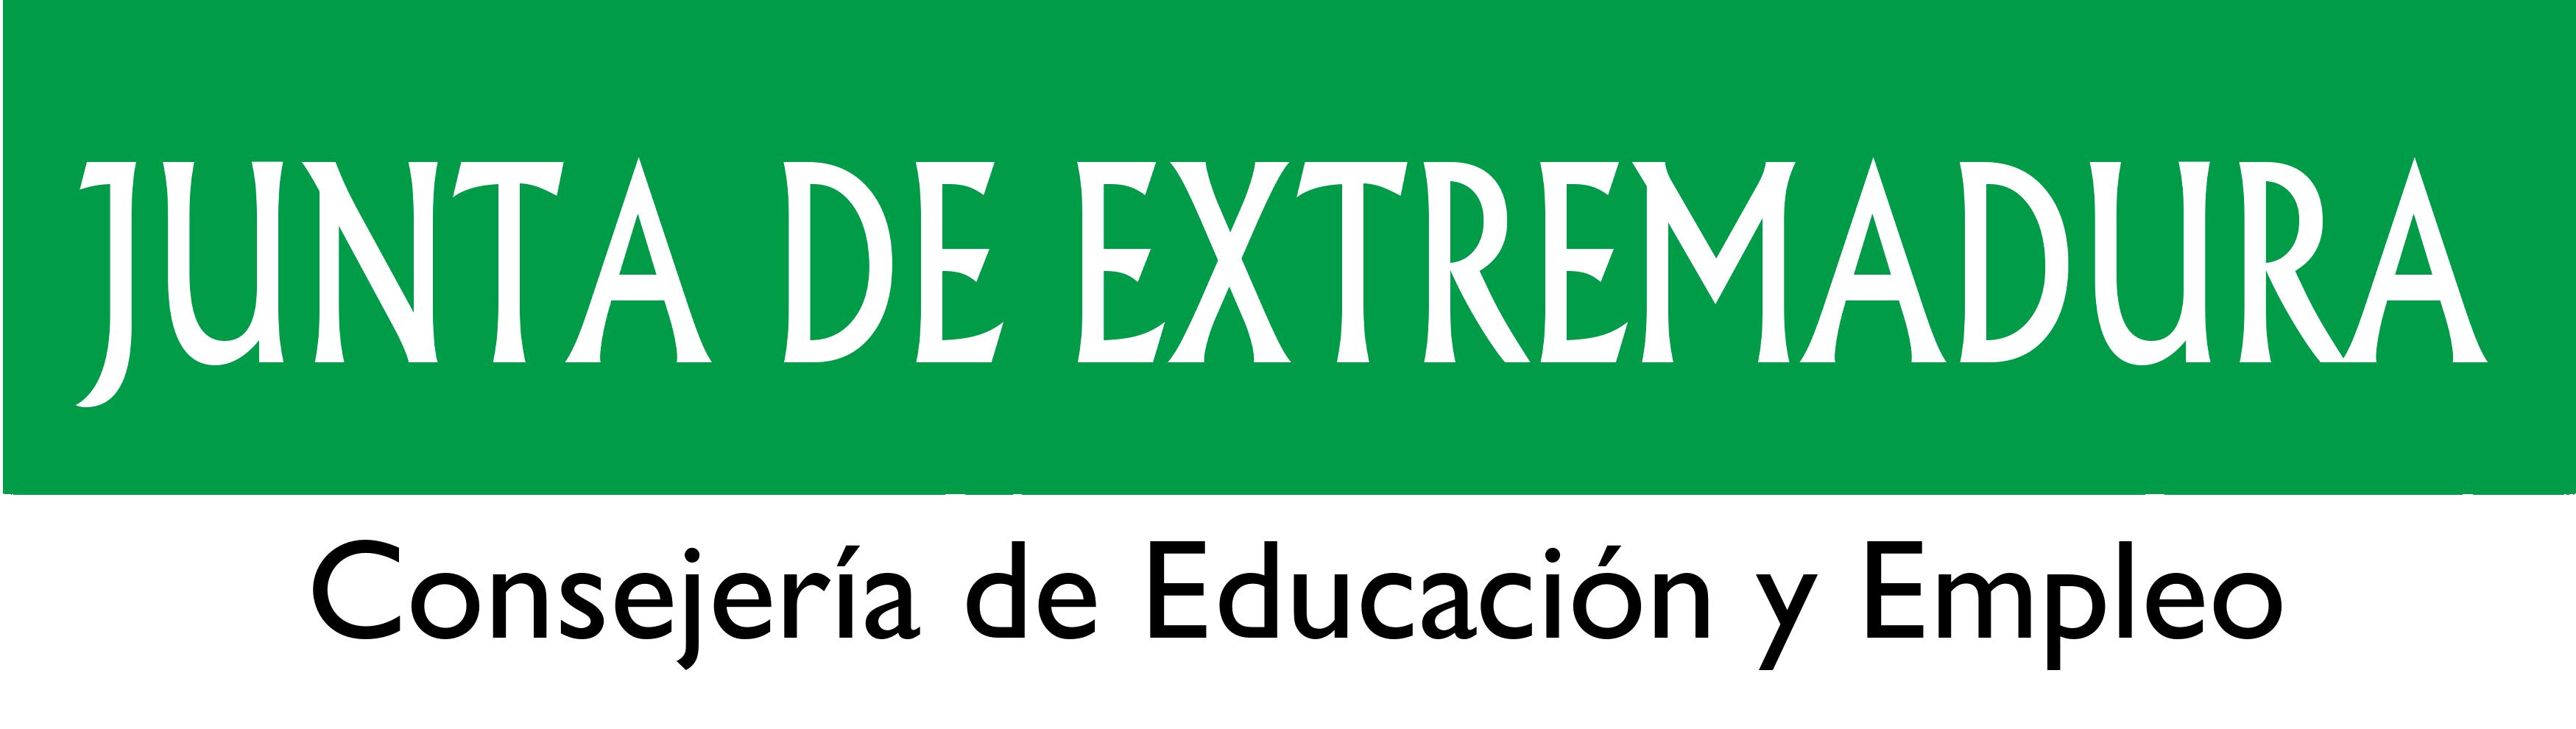 Junta_de_Extremadura_-_consejeria_-_fondo_verde(1)